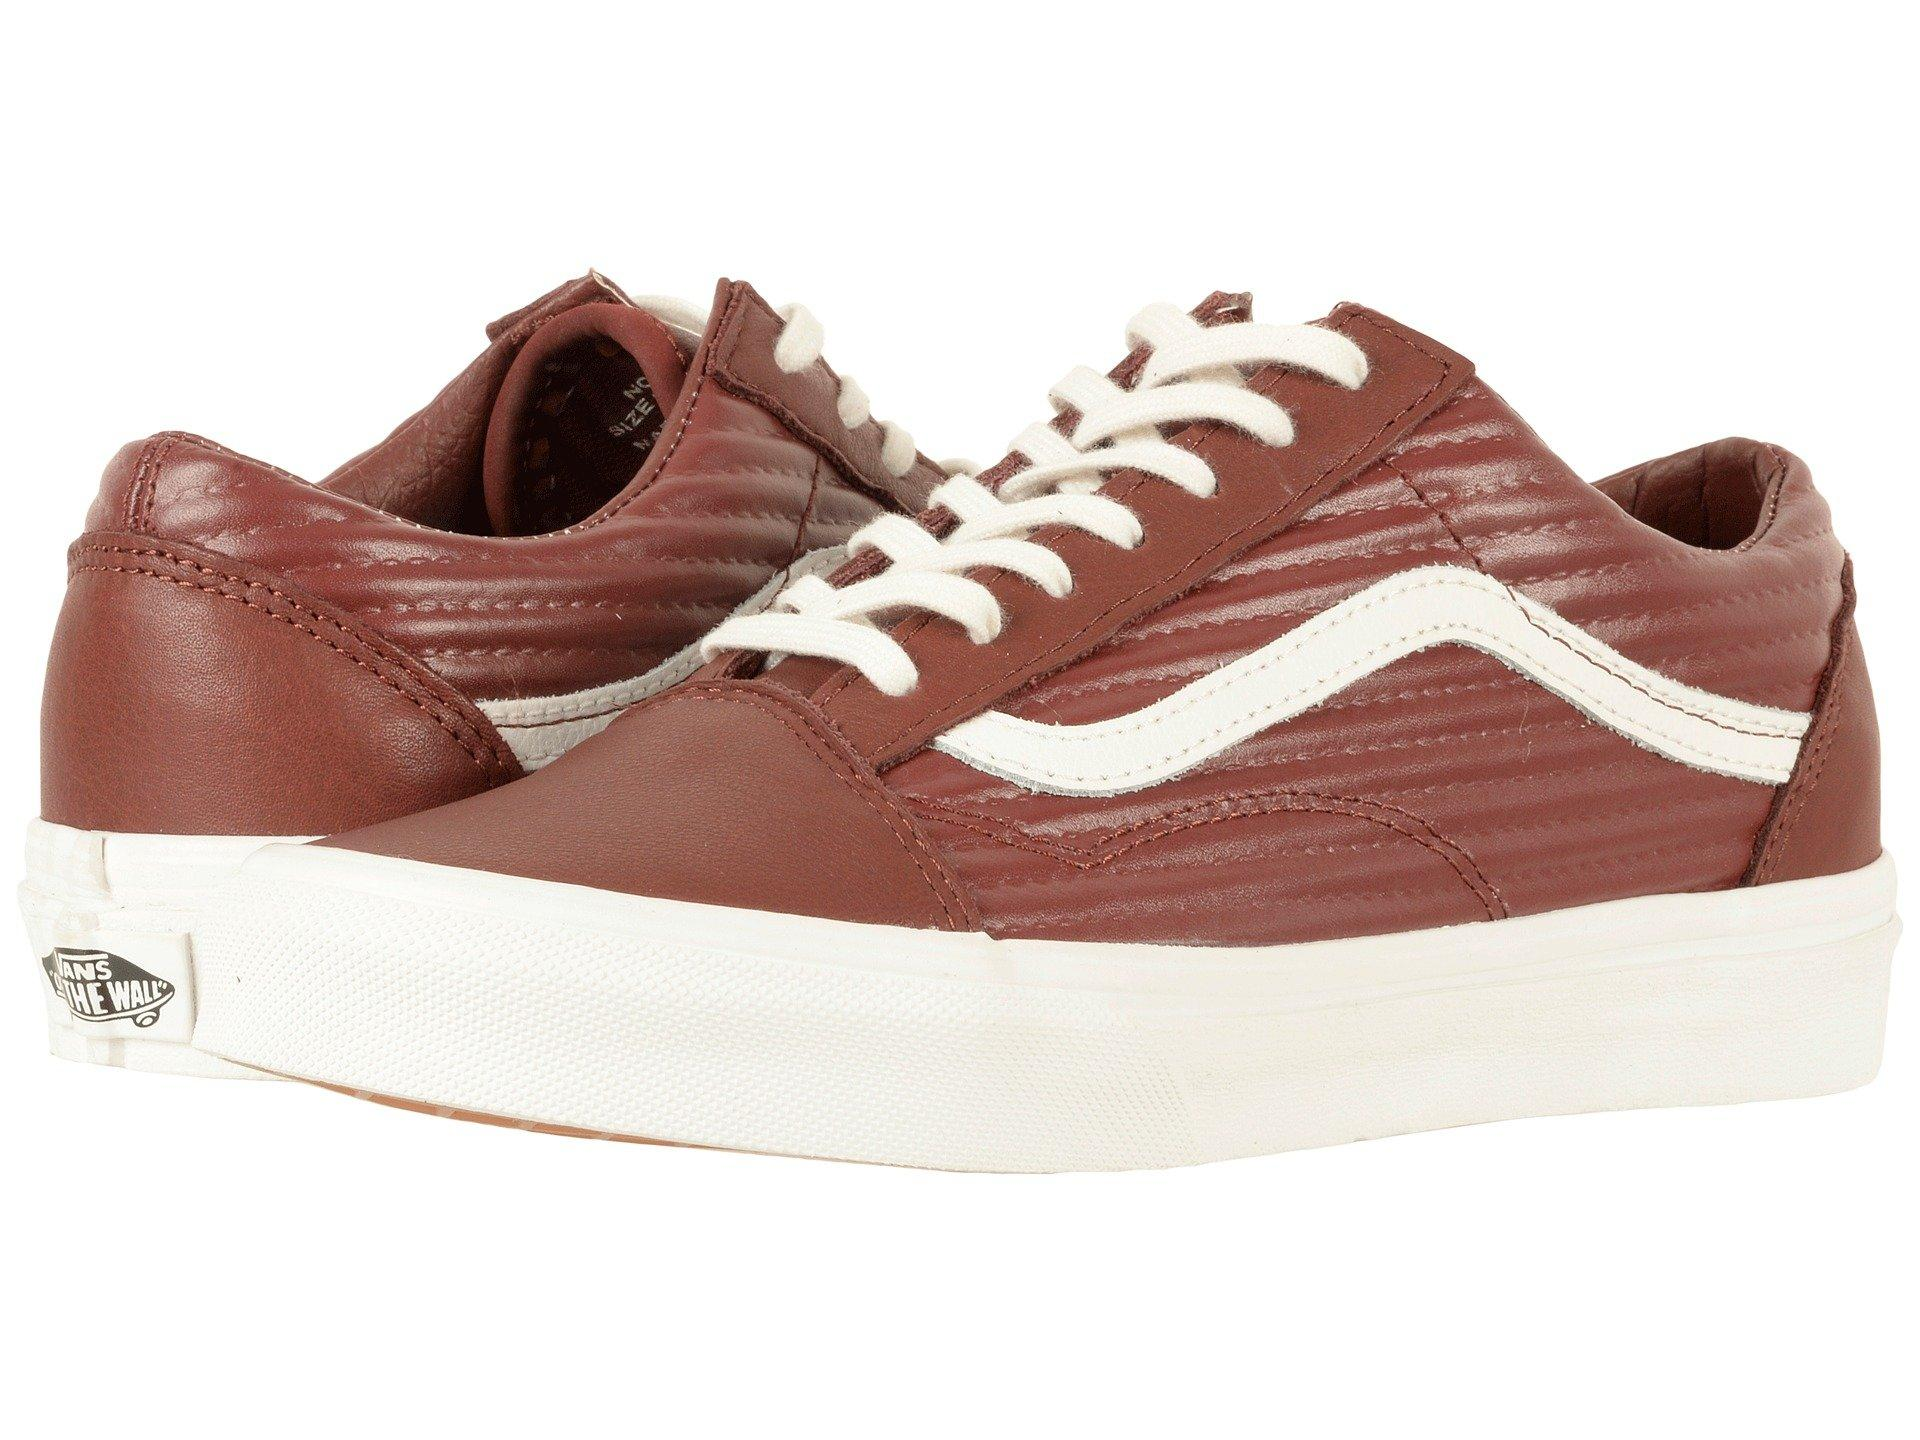 Vans Old Skool™, (moto Leather) Madder Brown/blanc De Blanc | ModeSens